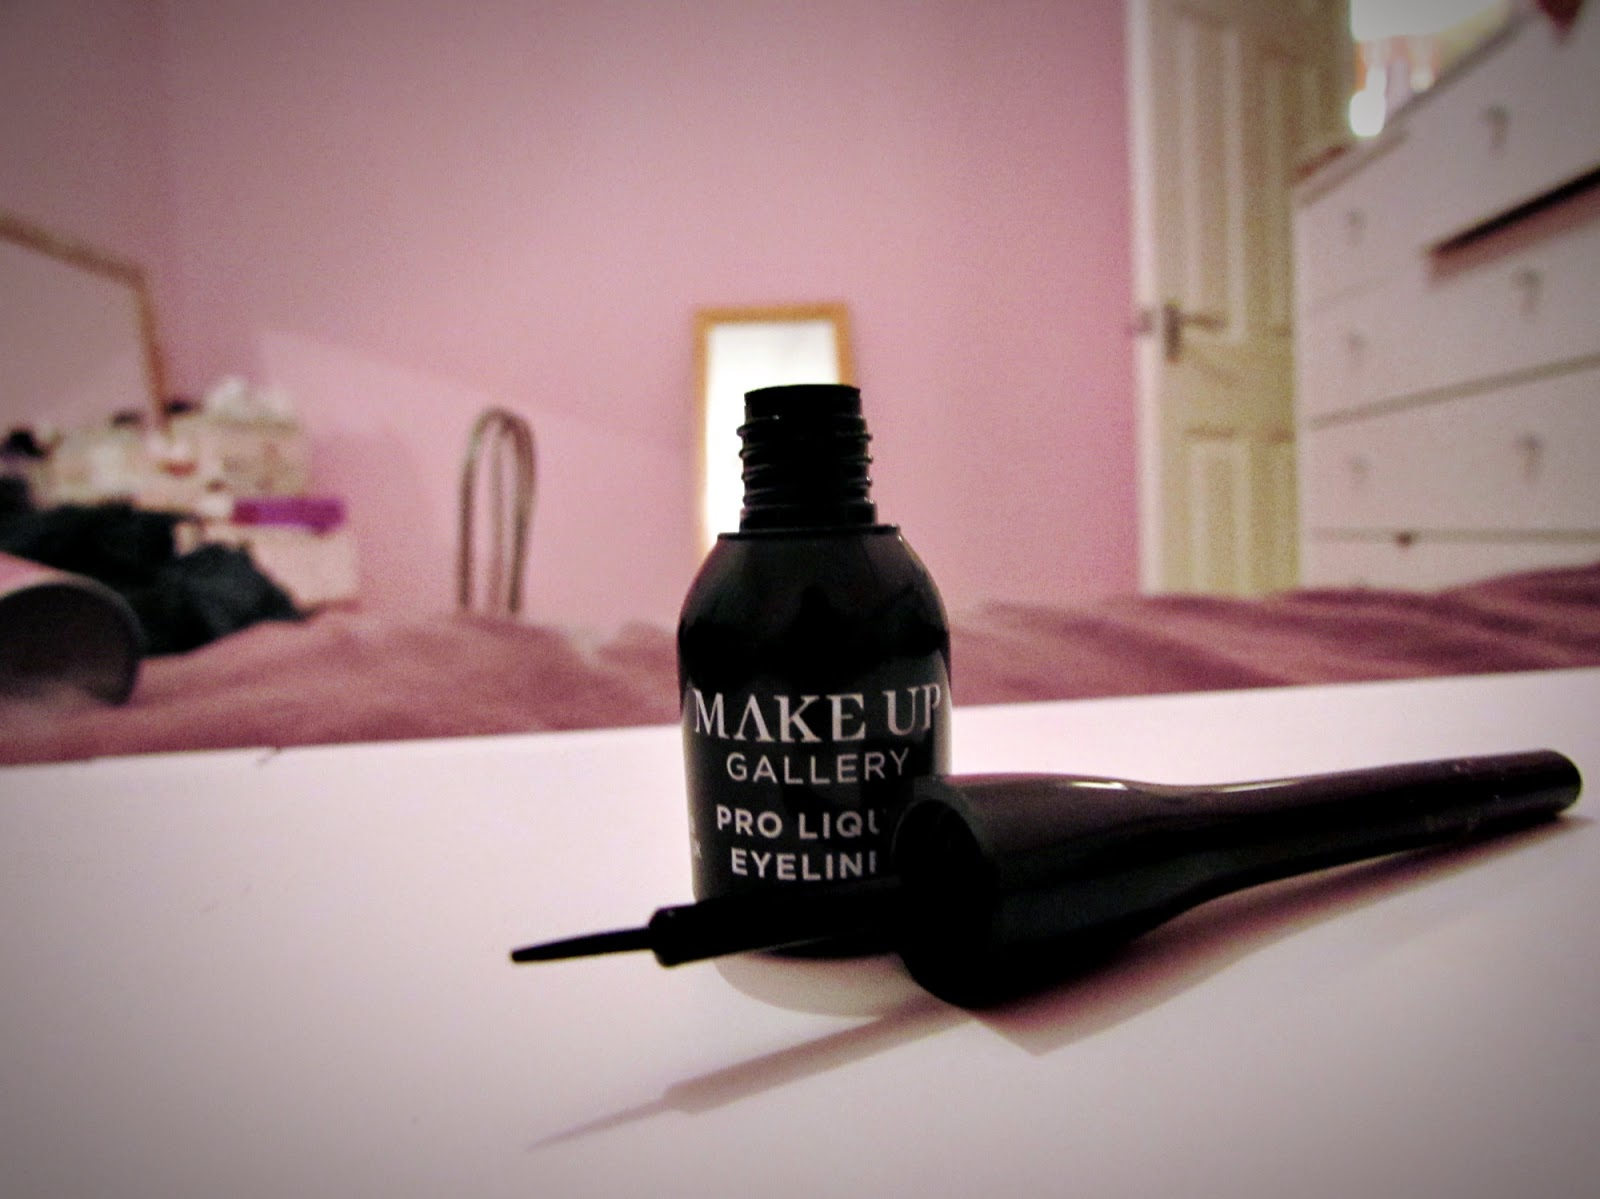 Poundland Makeup Gallery Liquid Eyeliner review